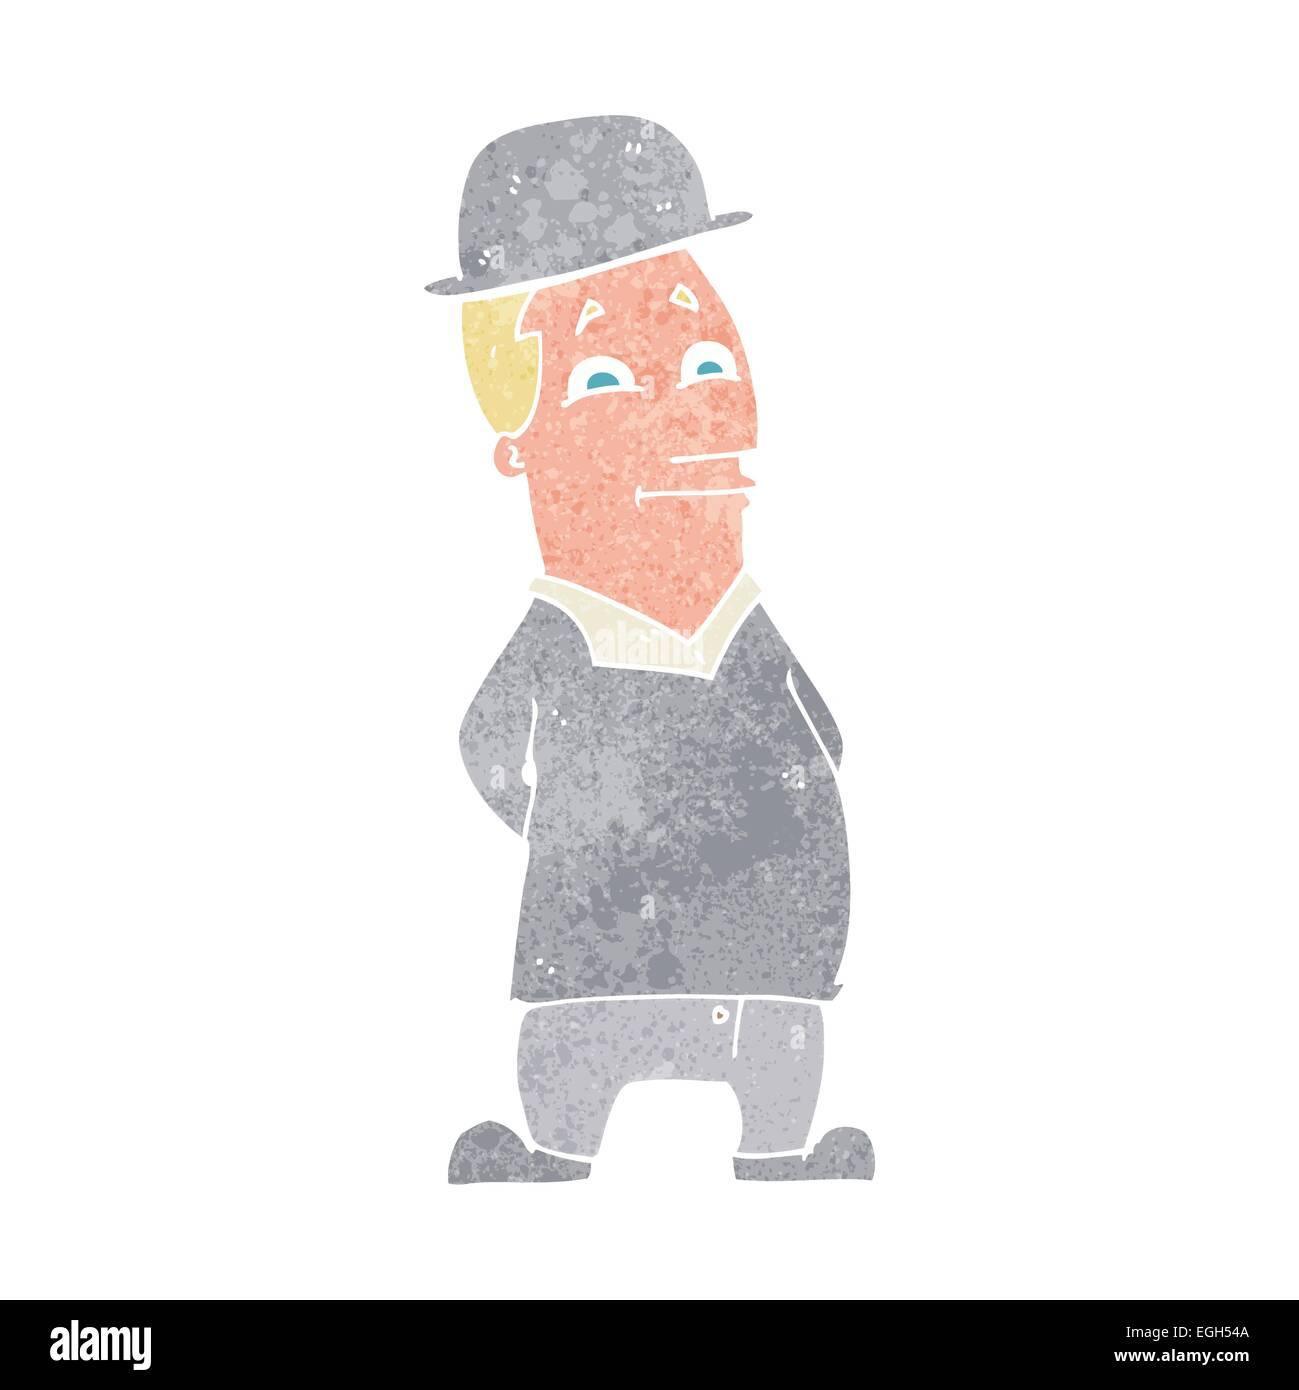 Cartoon Man Wearing British Bowler Hat Stock Vector Art